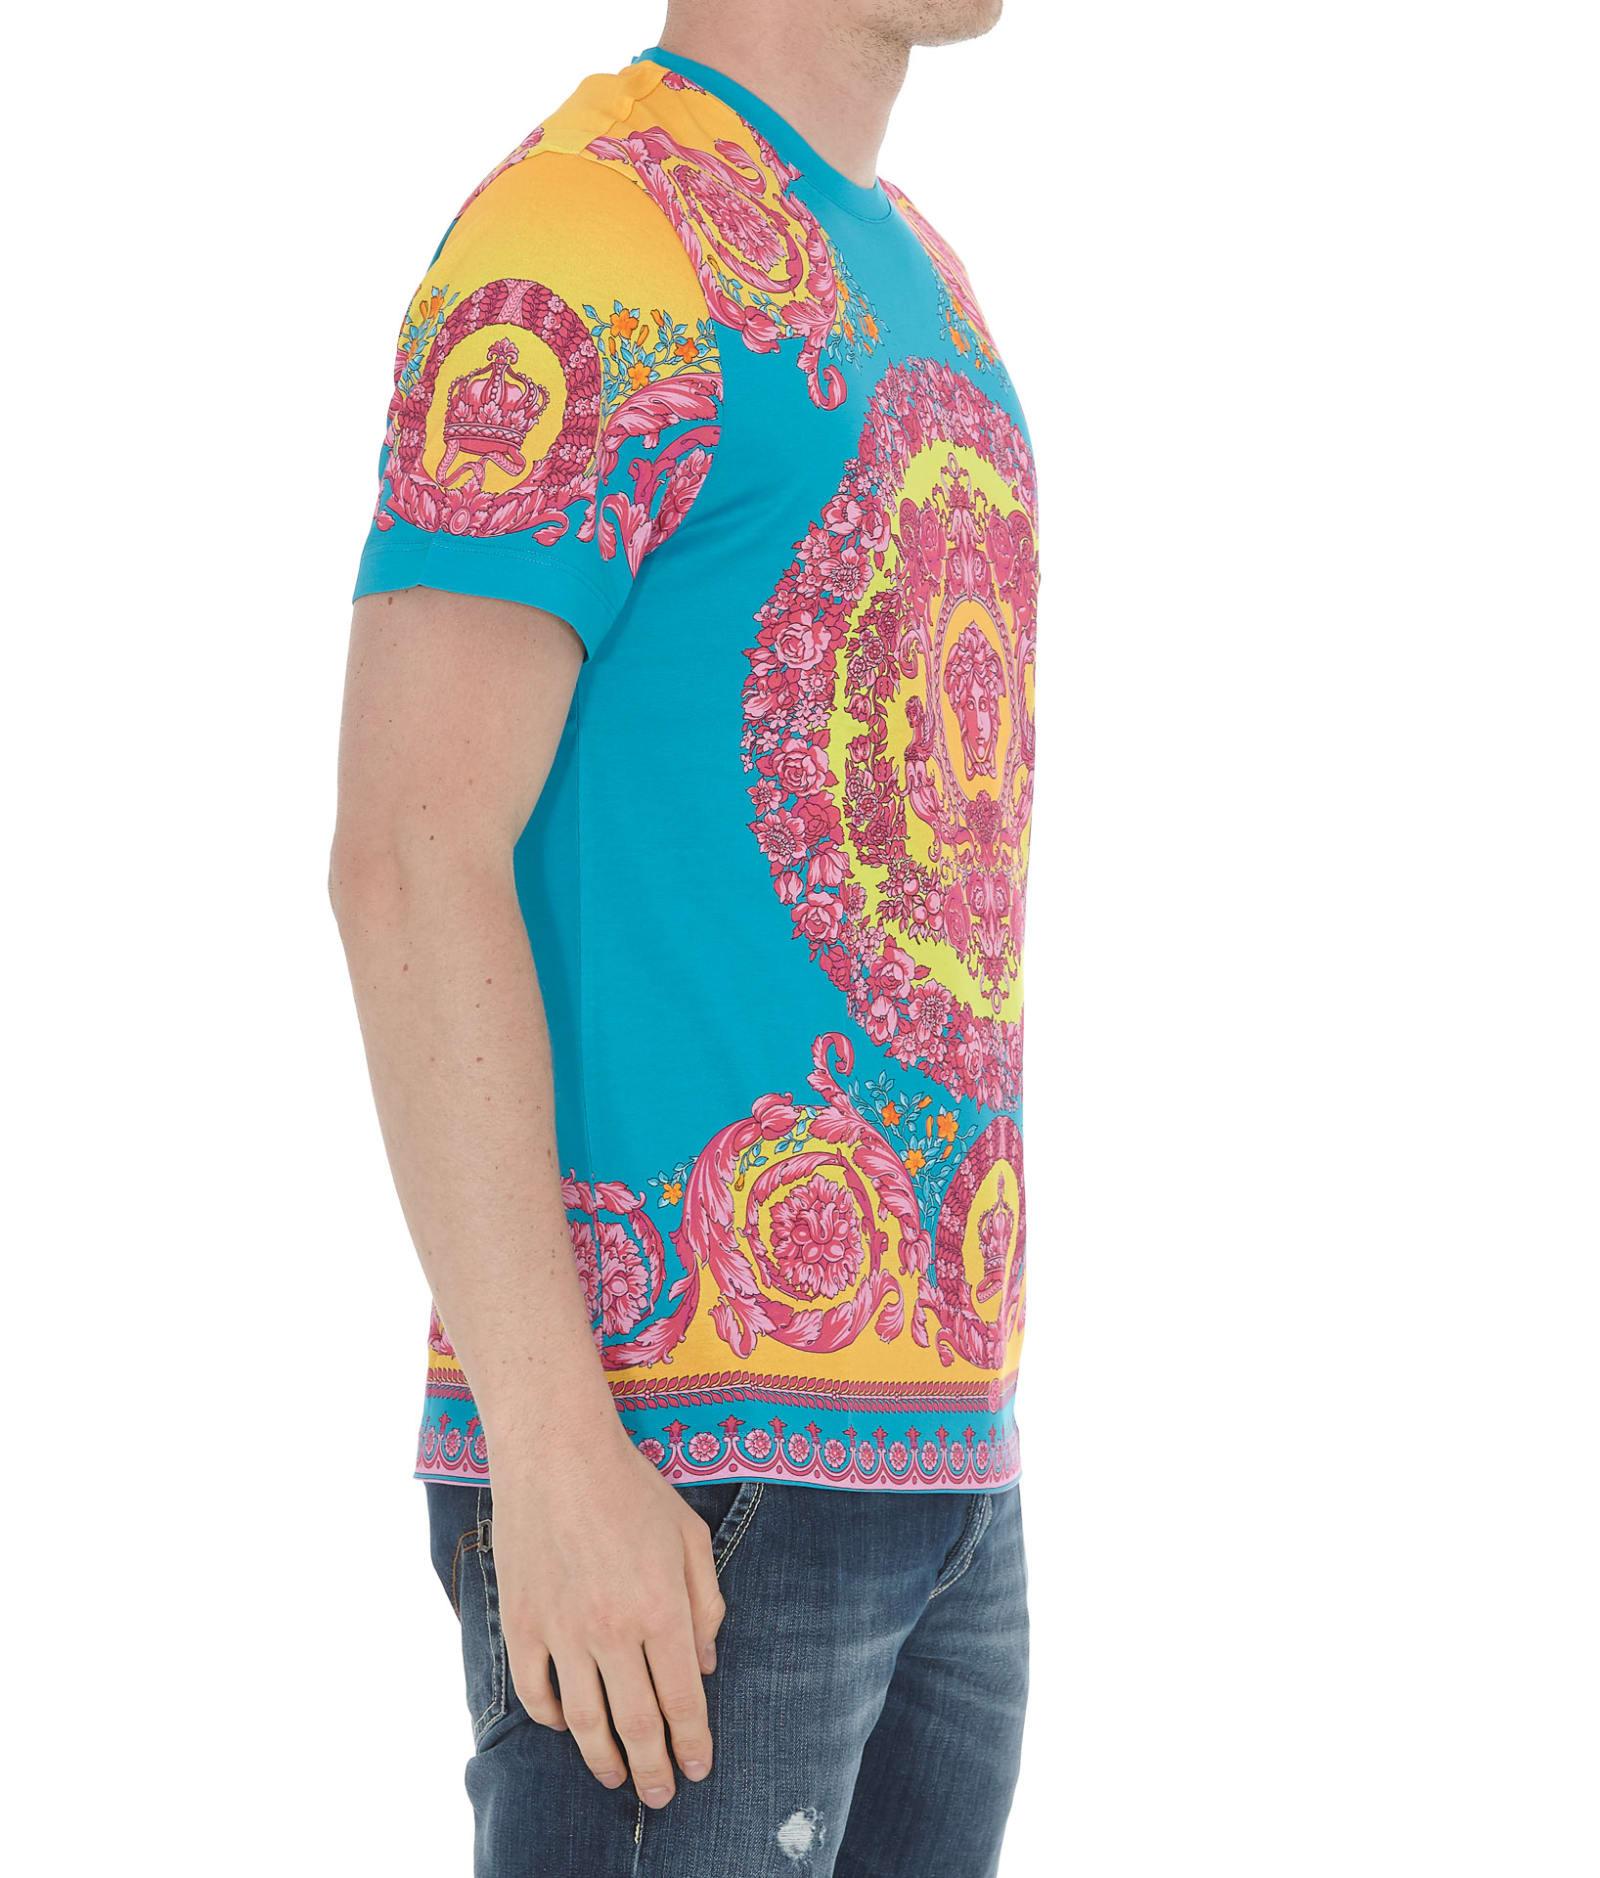 222b644de8 Versace Fluo Barocco Print T-shirt